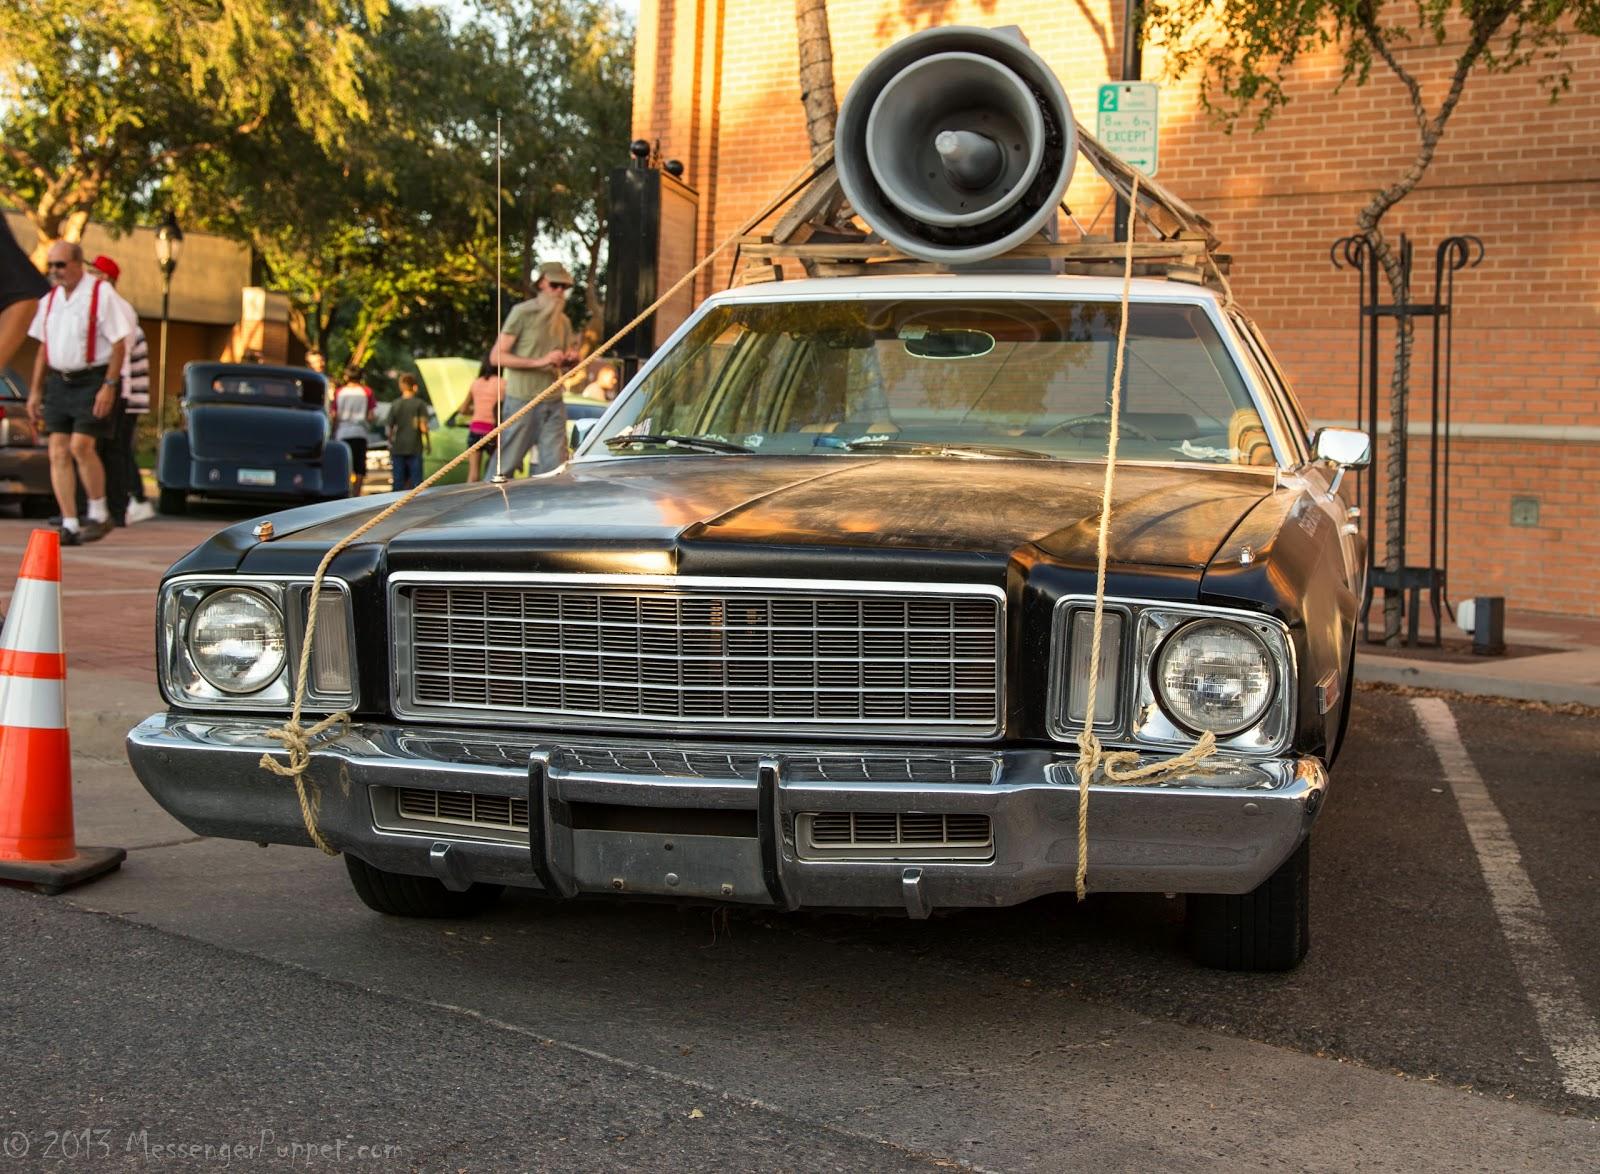 1974 Plymouth, Fury, bluesmobile